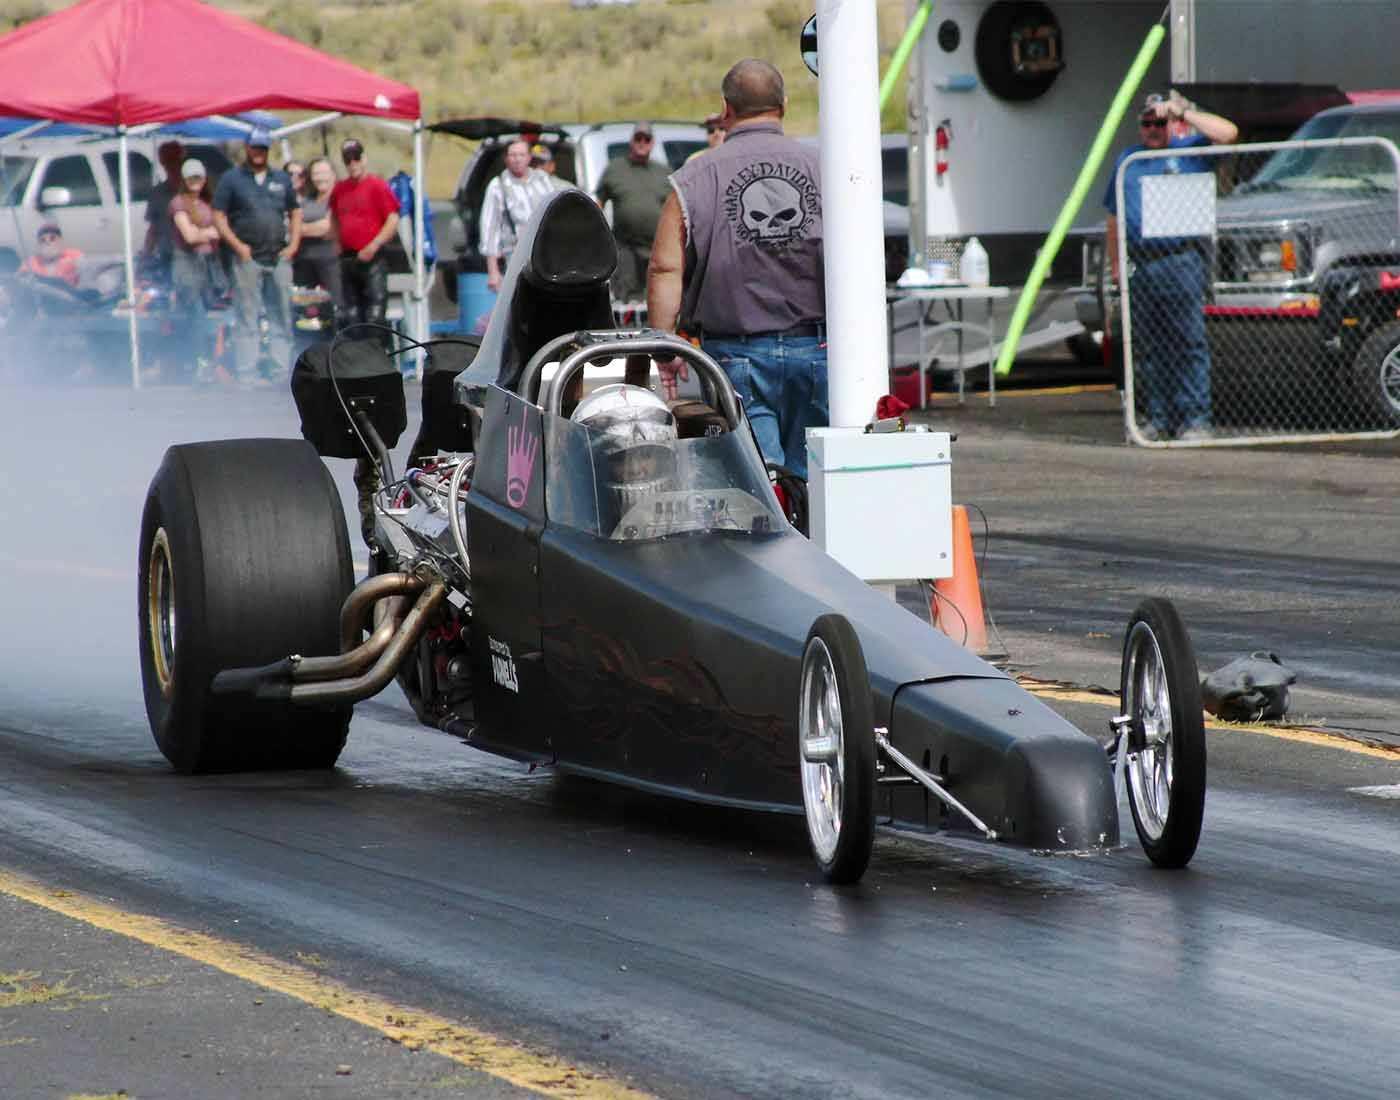 Drag motor racing